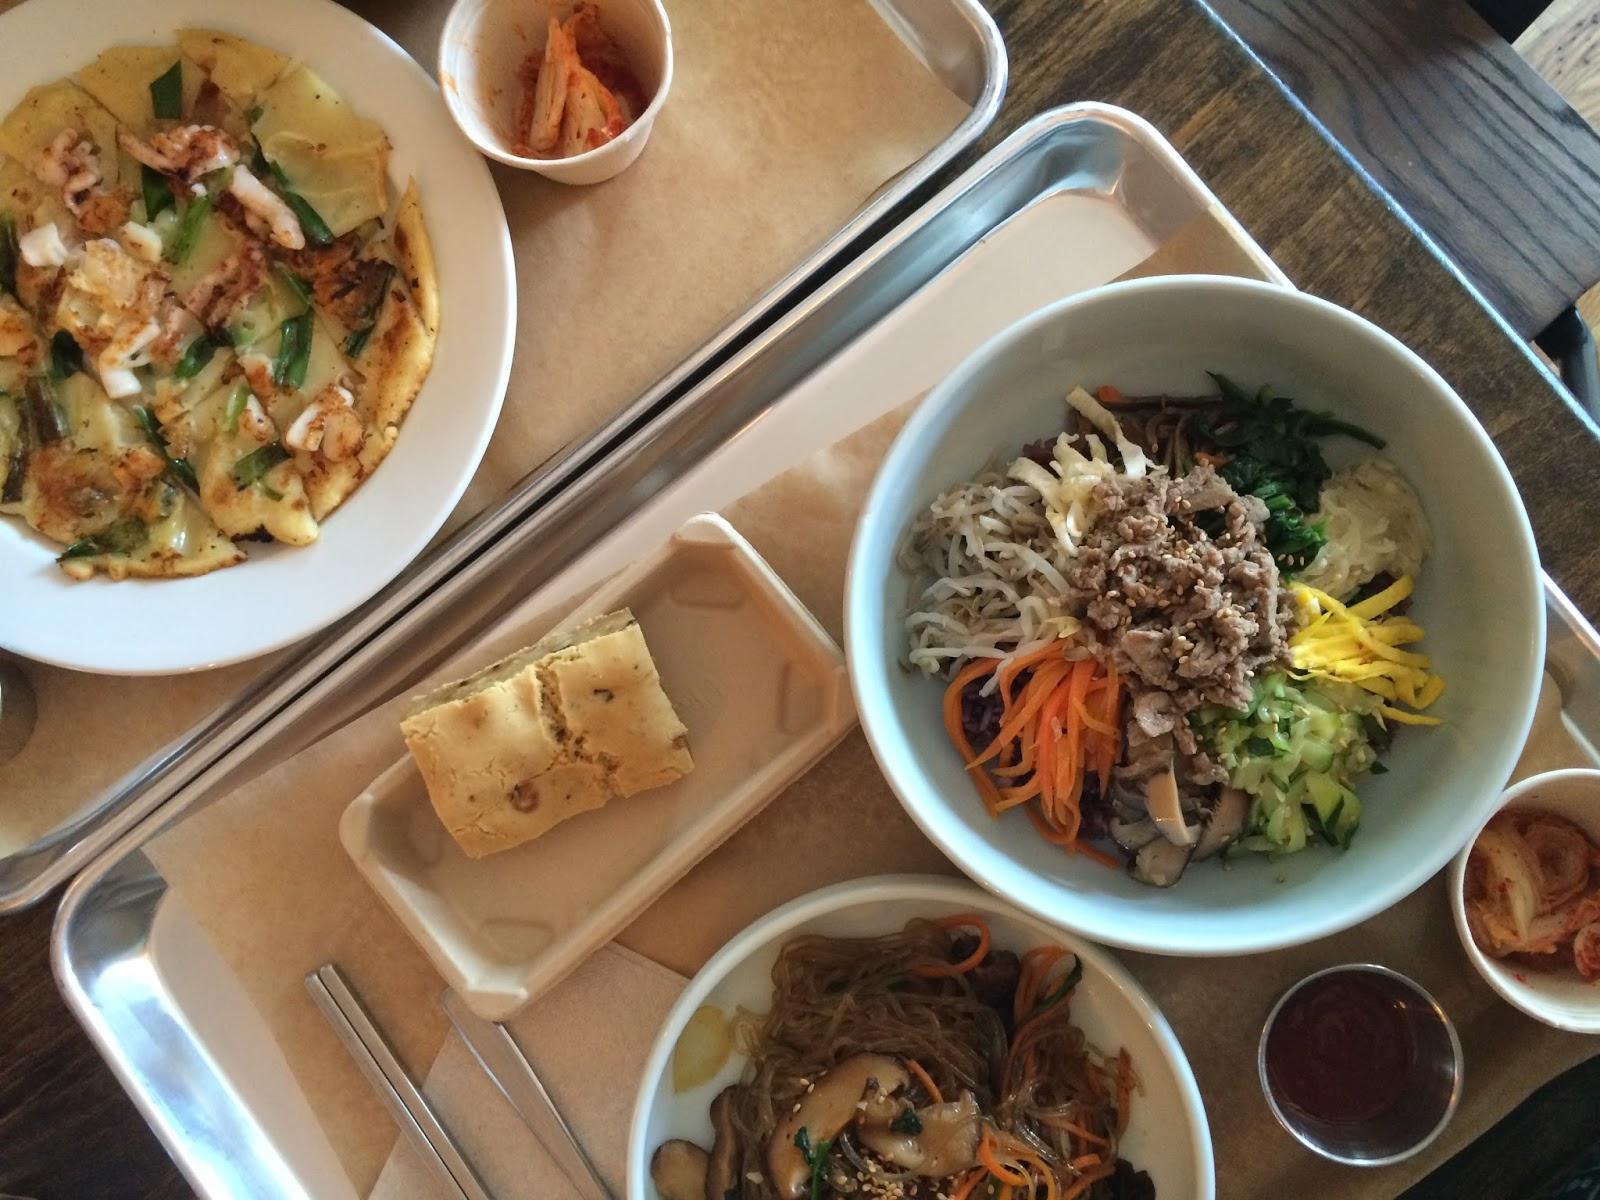 Chopsticks Optional Sunhee S Farm And Kitchen